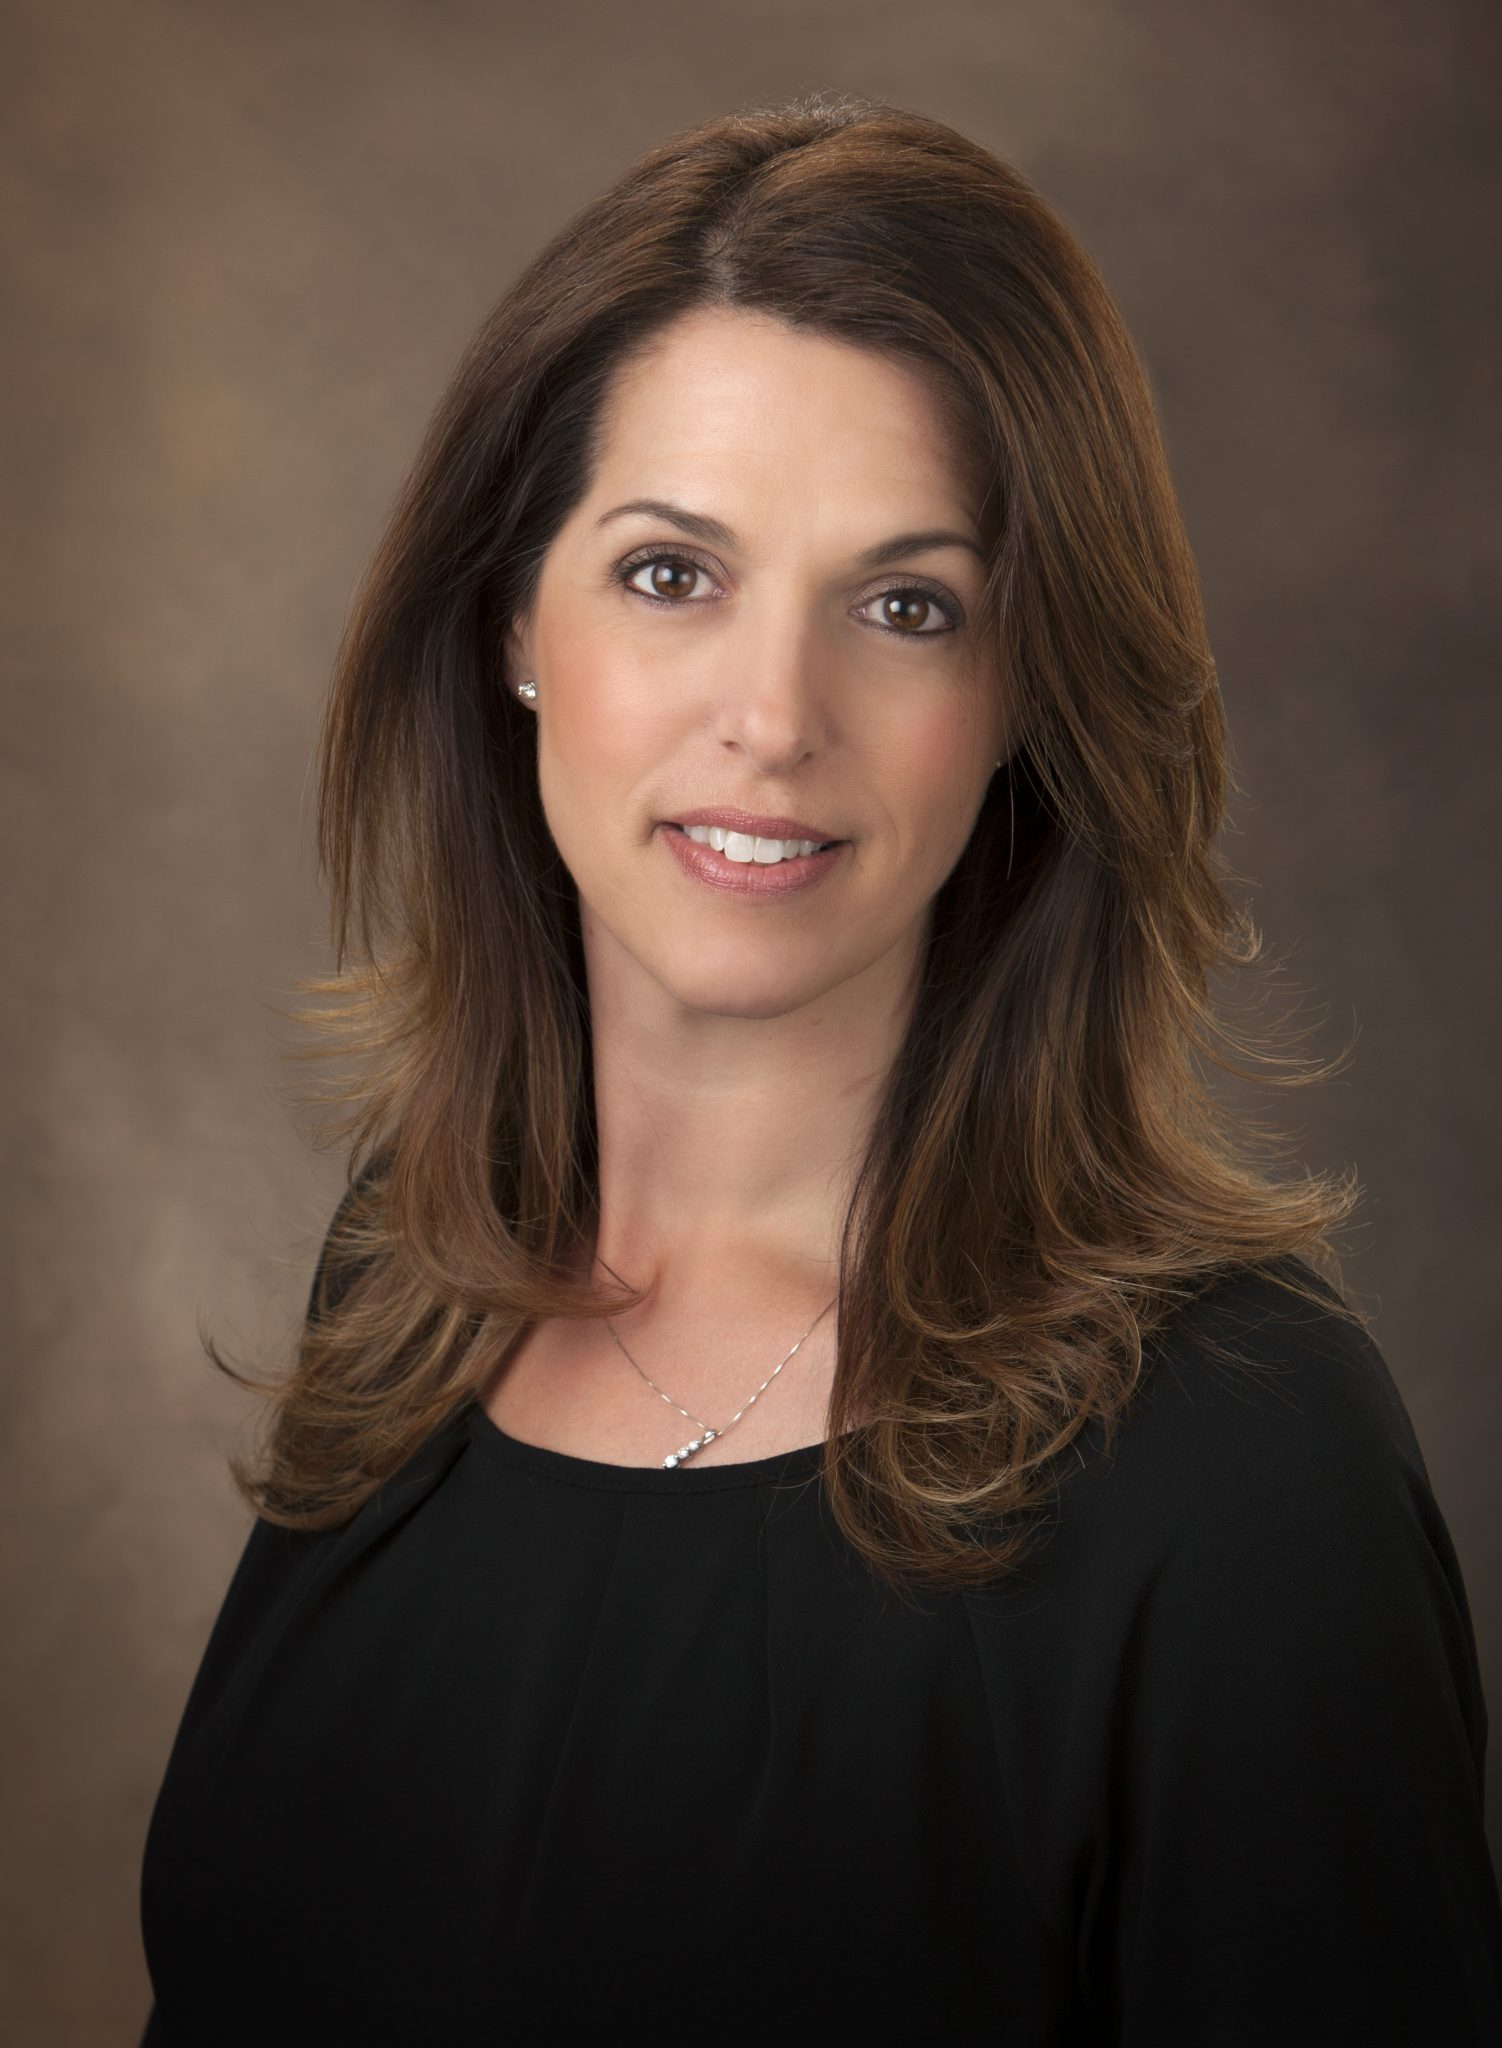 Allison Fitzpatrick